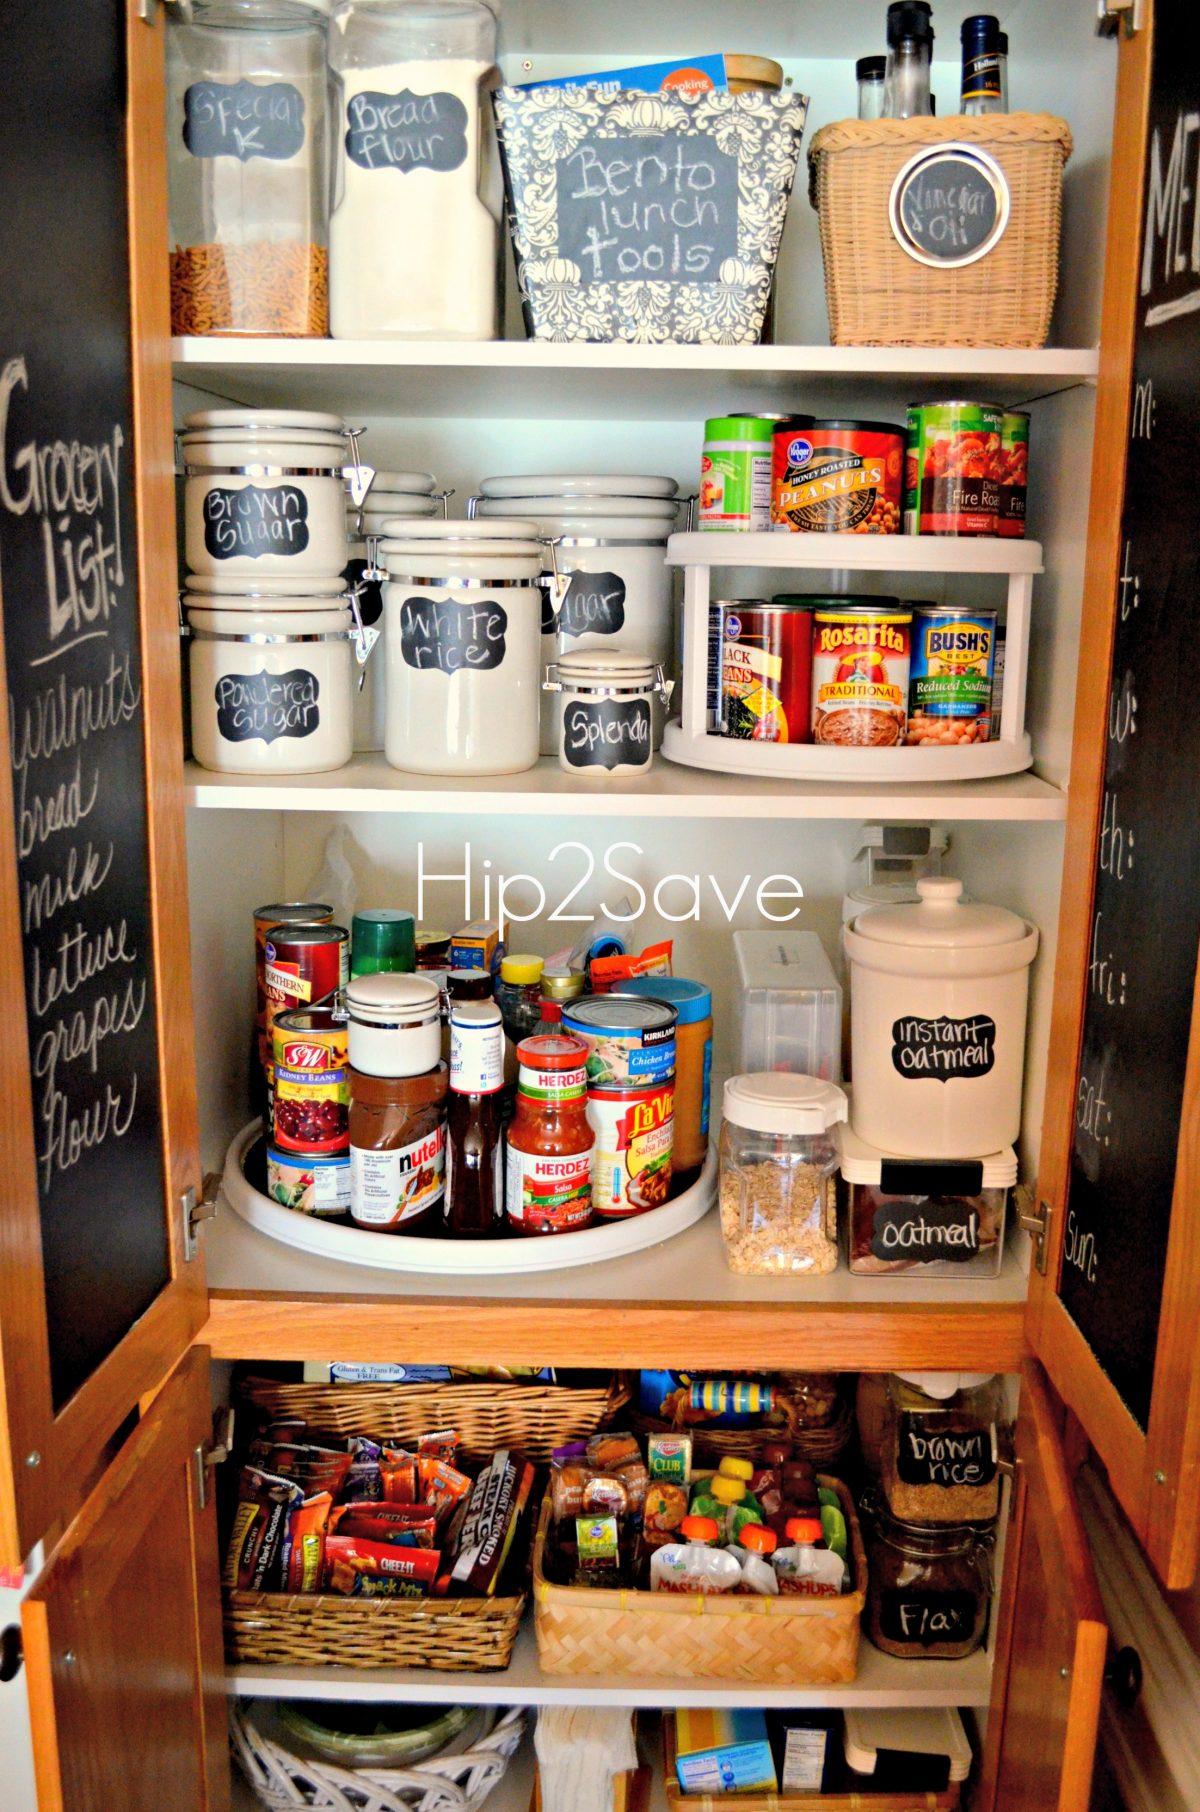 breathtaking easy kitchen organization ideas | 4 Simple Pantry Organization Tips - Hip2Save